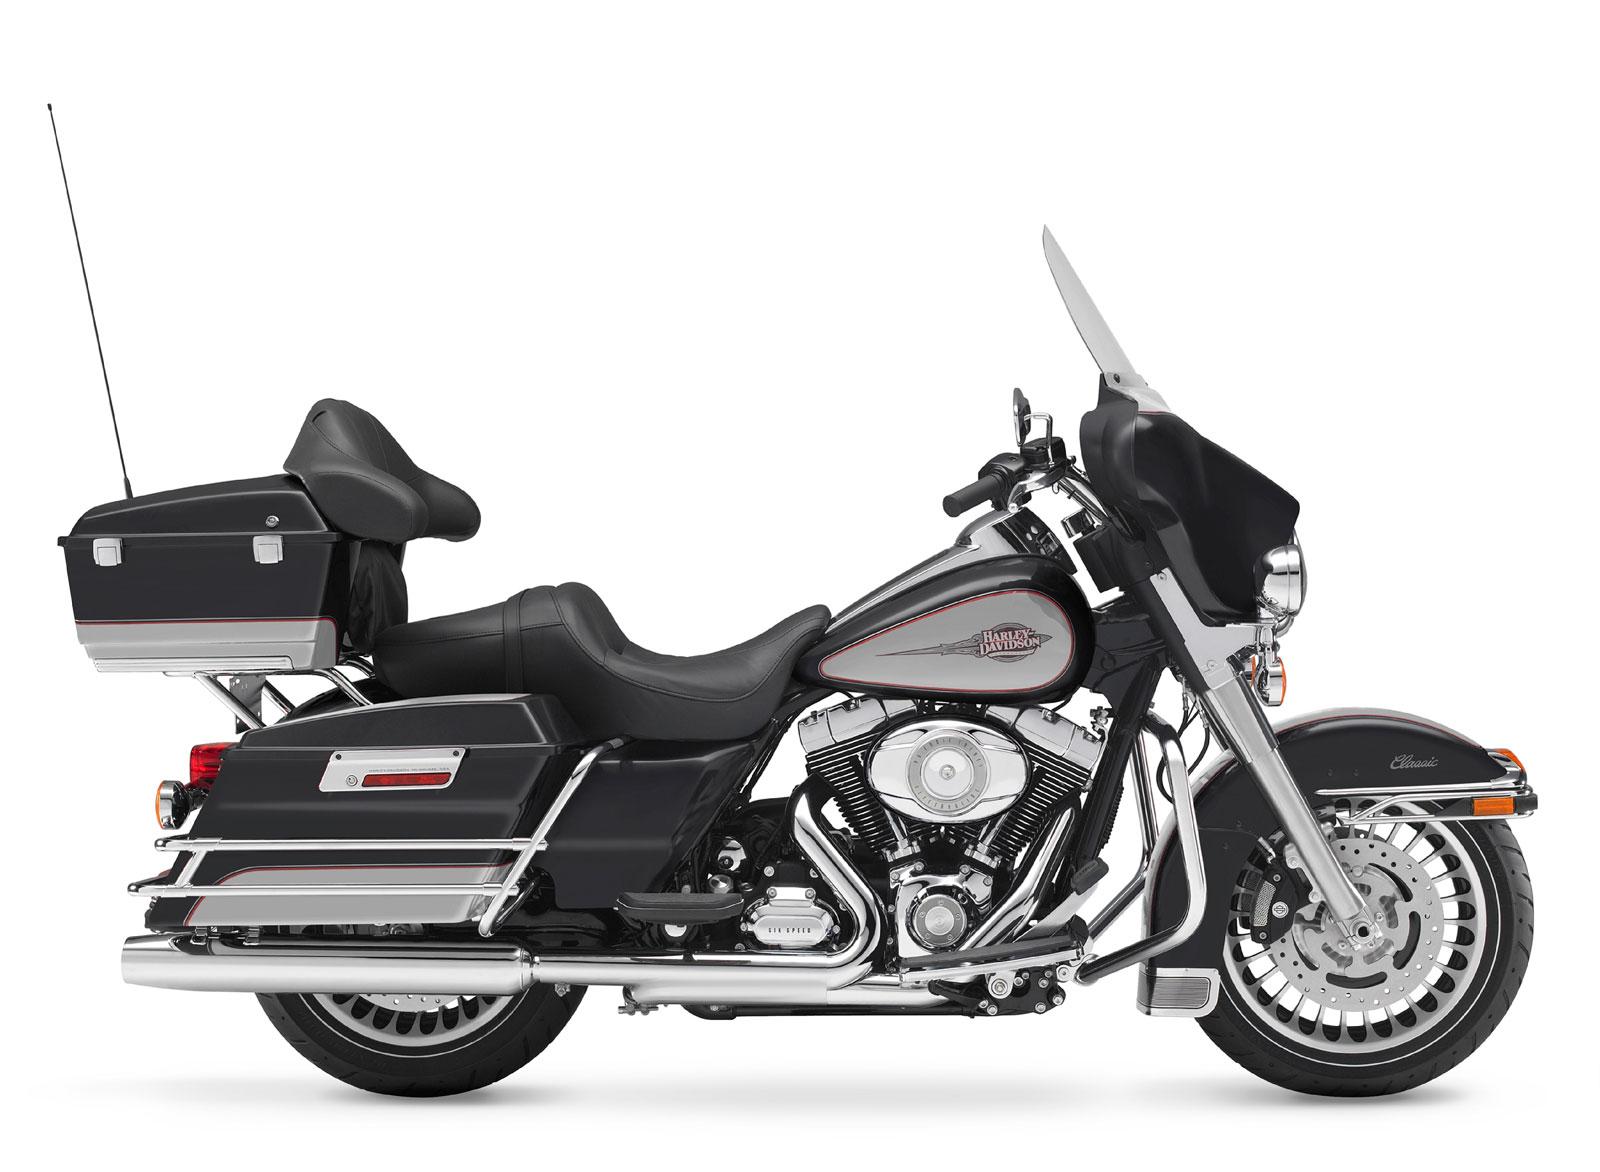 2009 Harley-Davidson FLHTC Electra Glide Classic